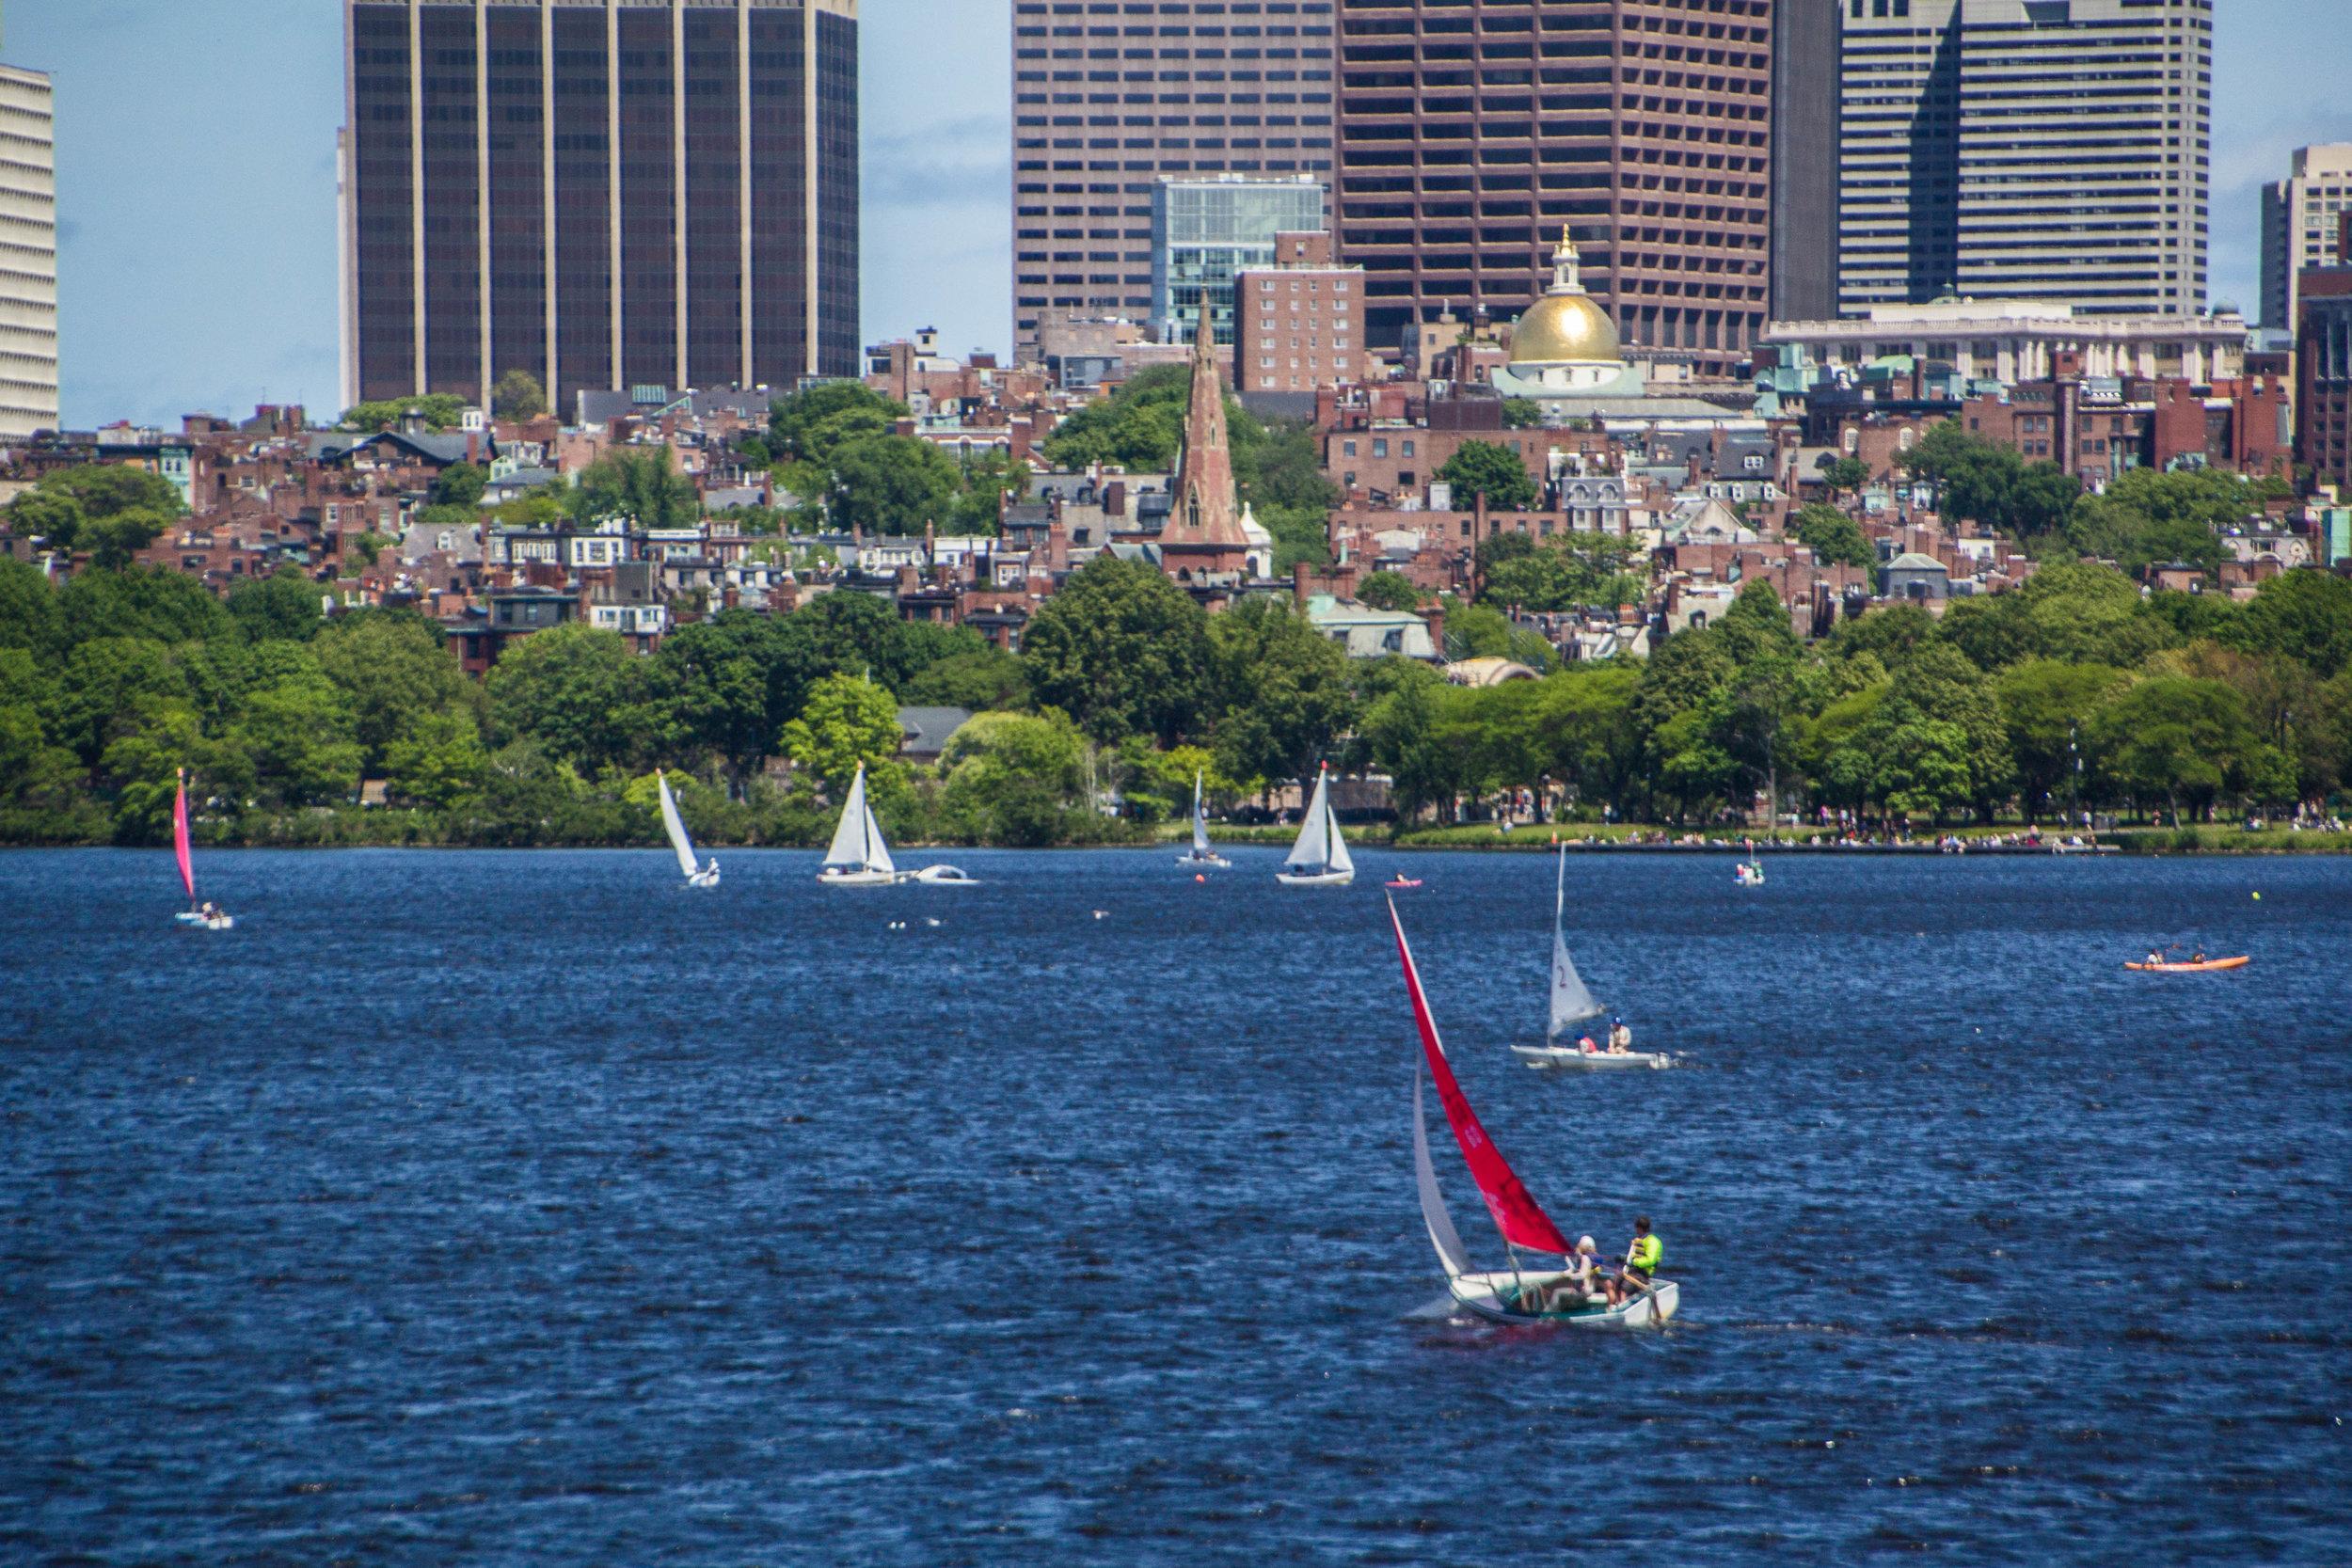 mass-ave-bridge-smoots-boston-9.jpg